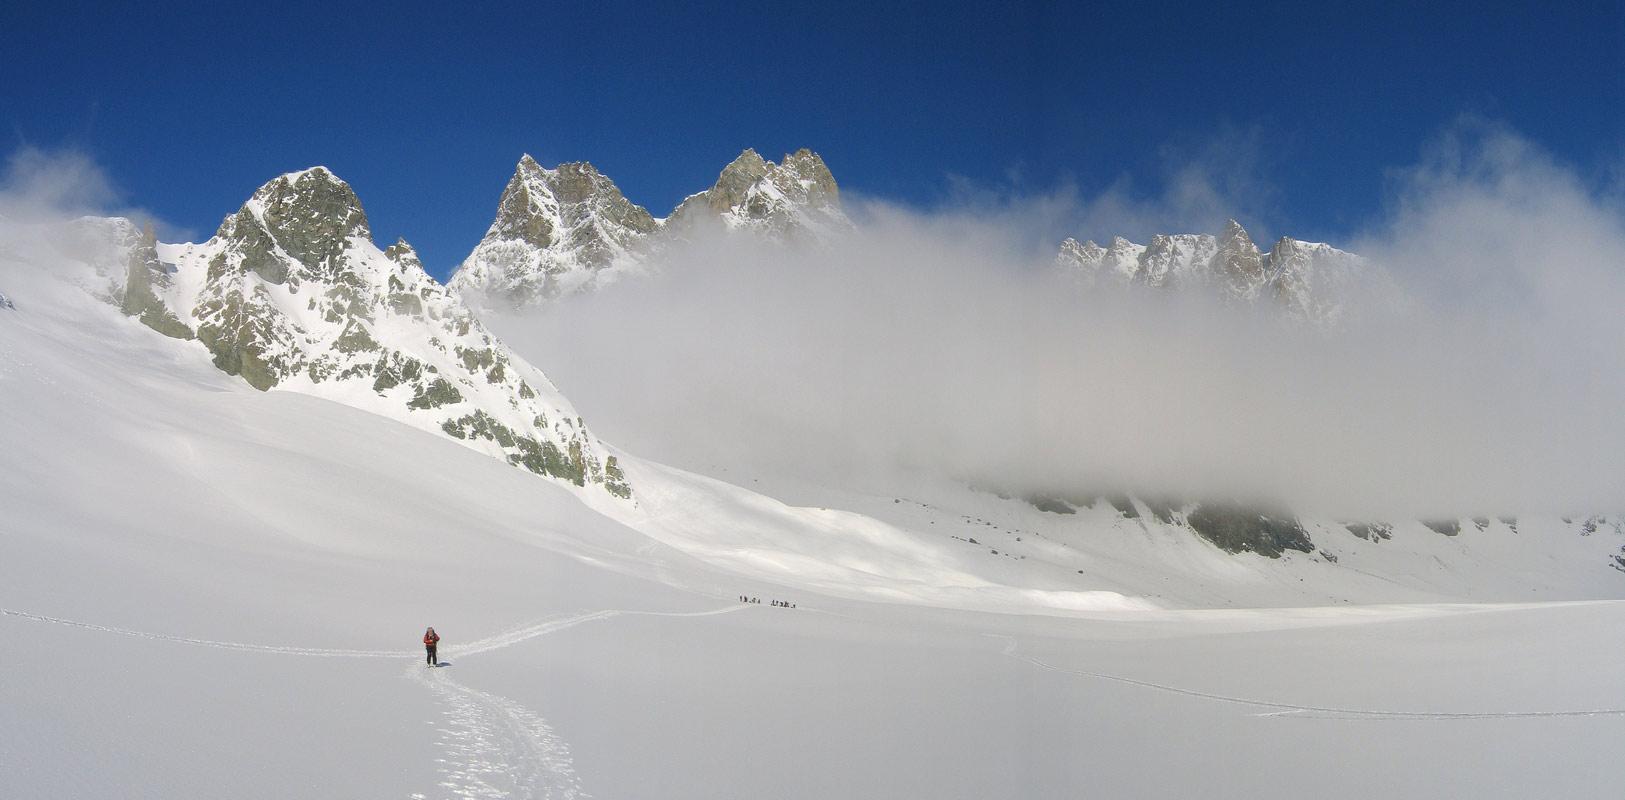 Col Valpelline, Day 6 H.R. Chamonix-Zermatt Walliser Alpen / Alpes valaisannes Švýcarsko panorama 31